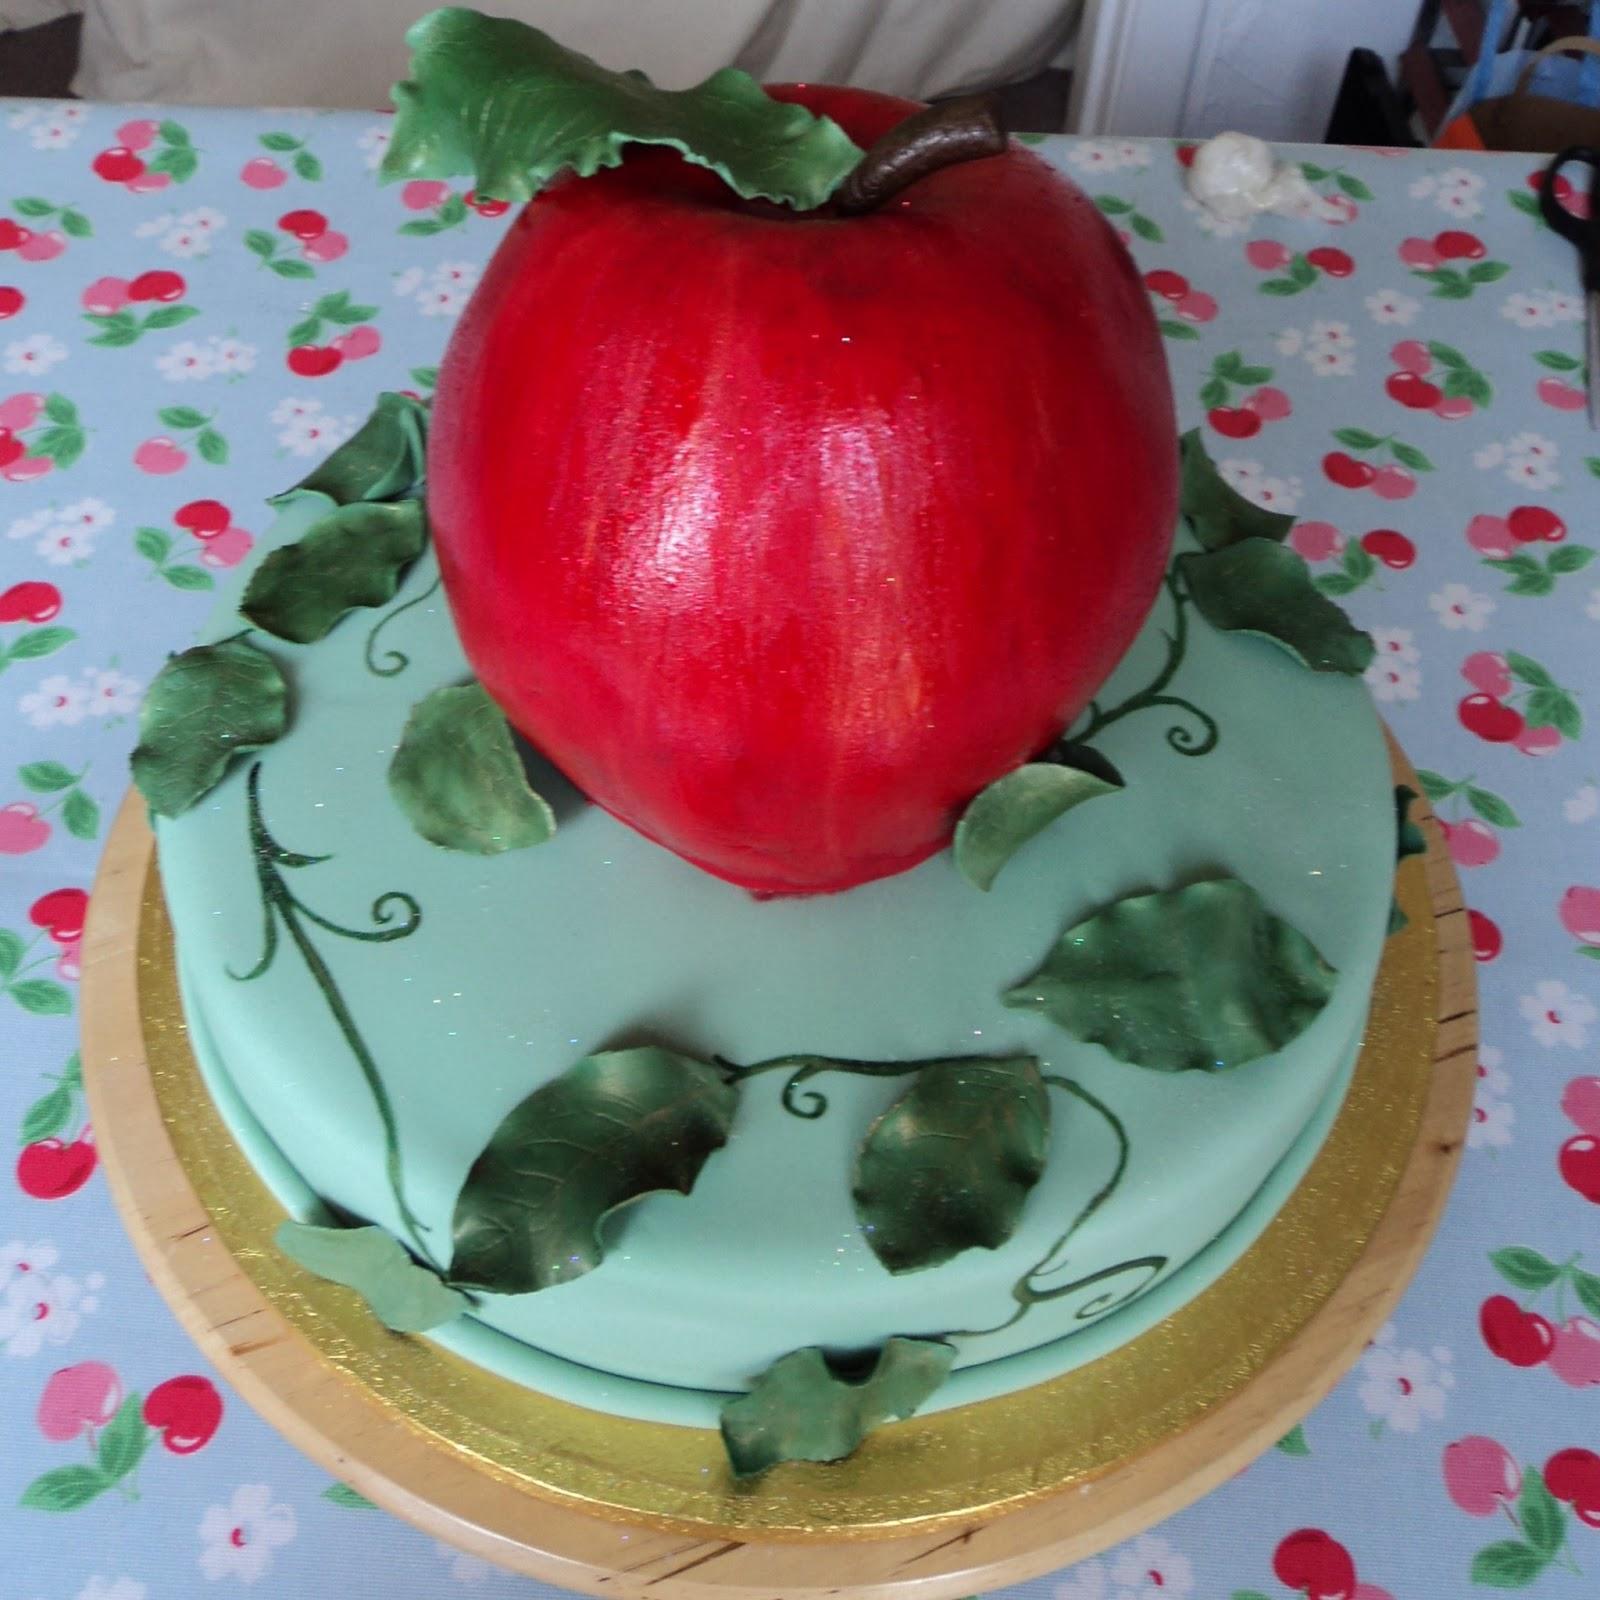 Photos Of Delicious Birthday Cake : Kiss Me Cake Bakery: Novelty Wedding Cakes